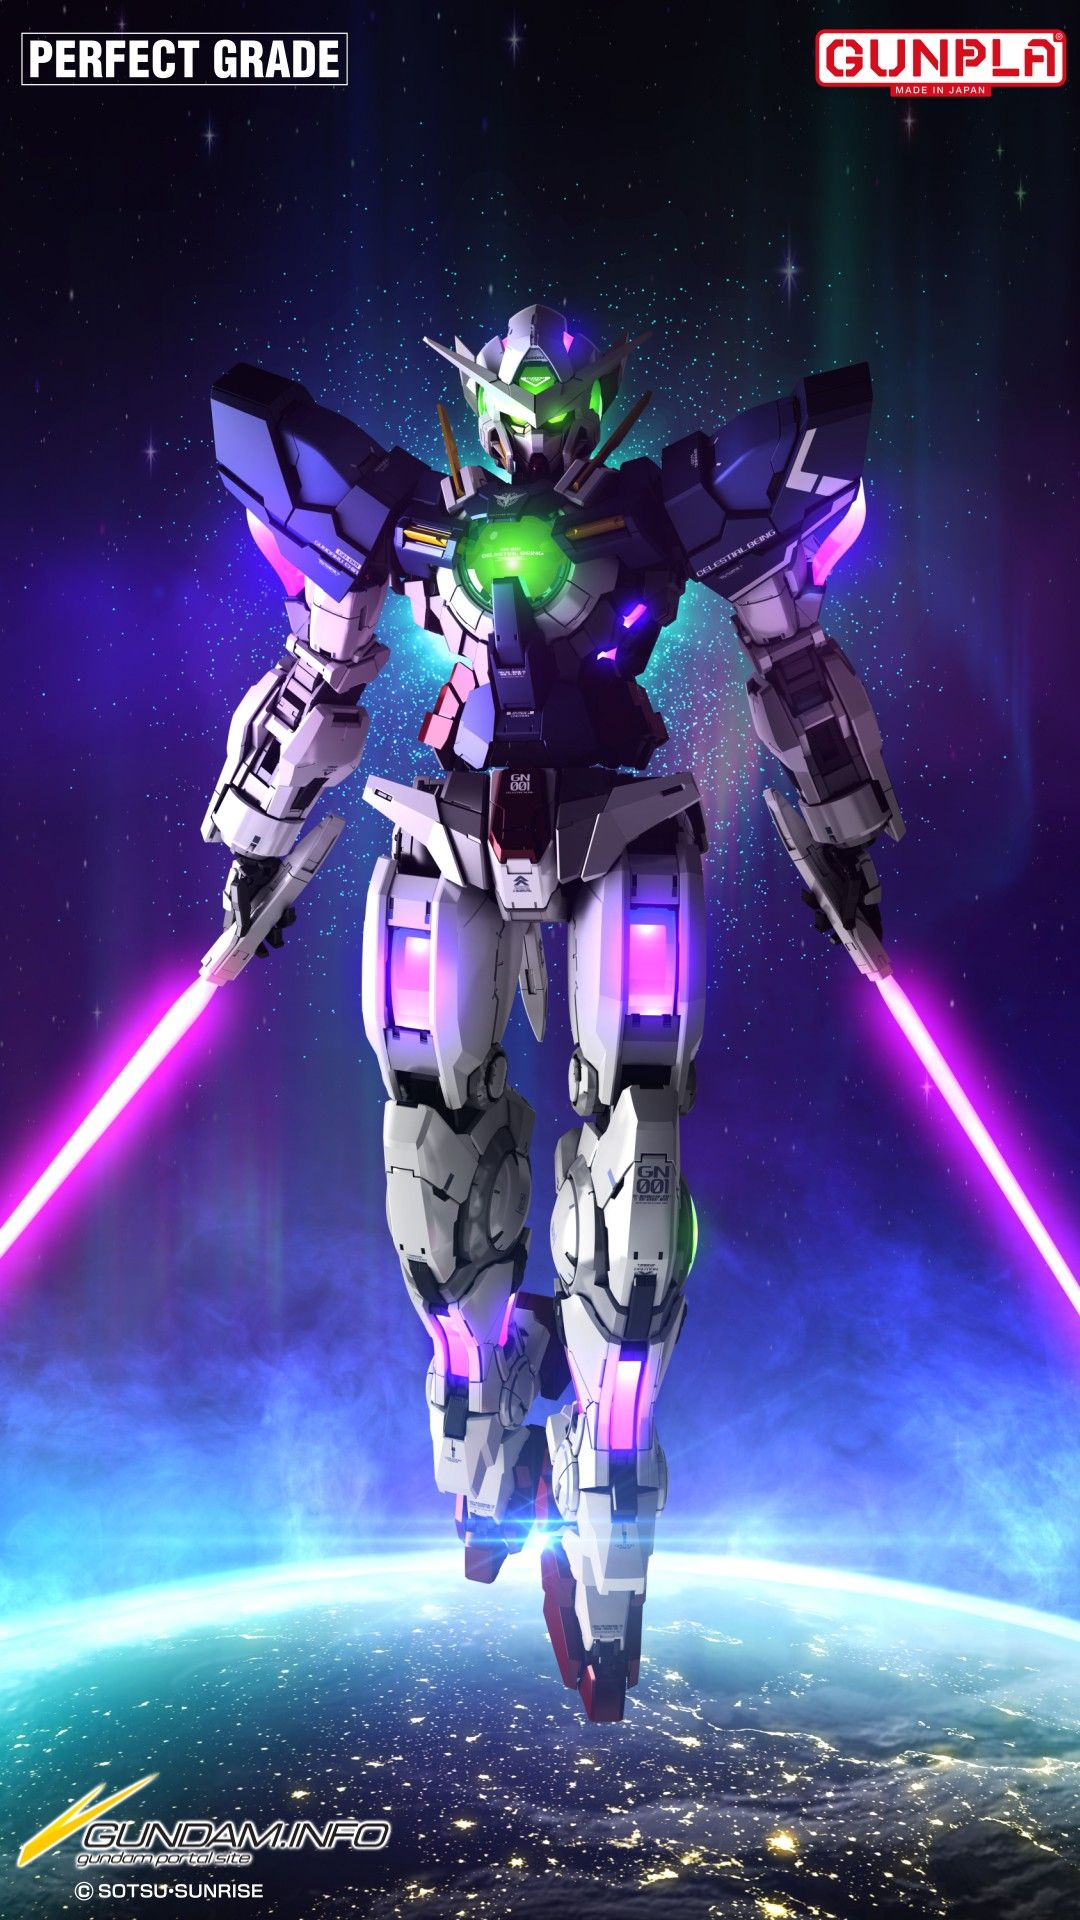 Gundam Exia PG Gunpla Gundam.info Wallpaper Gambar anime